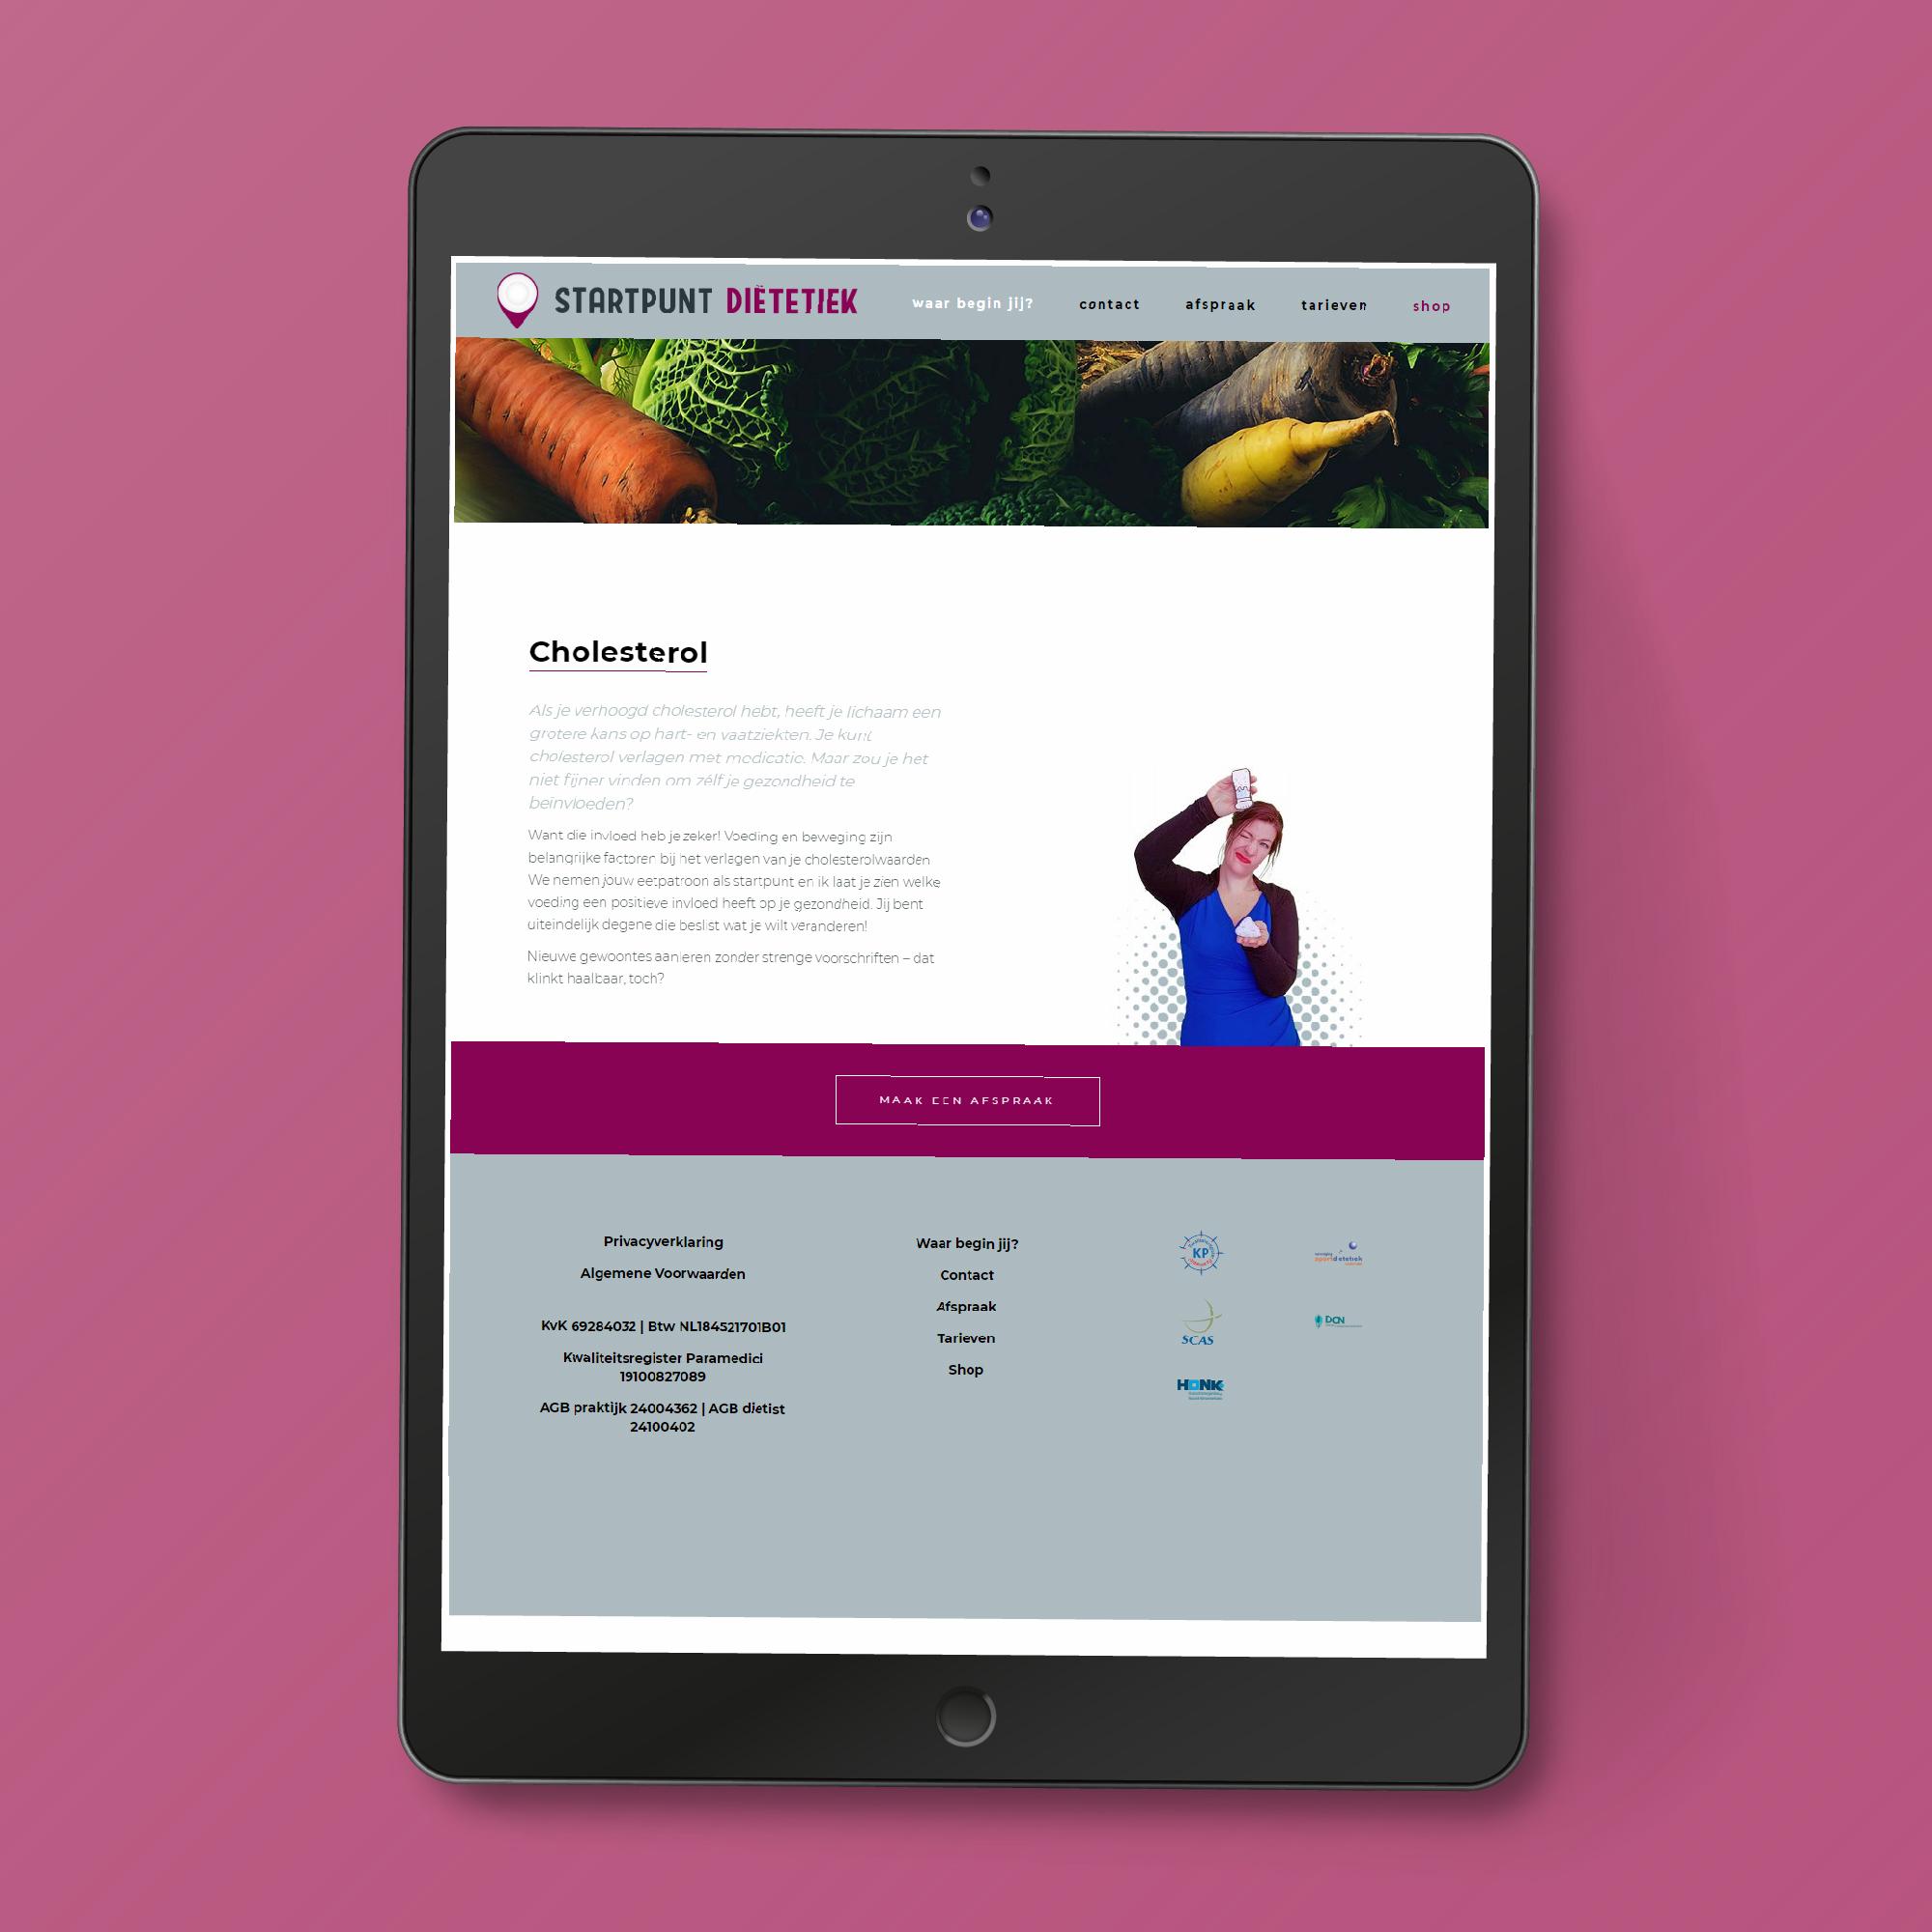 portfolio-dimgray-startpunt-dietetiek-website-2